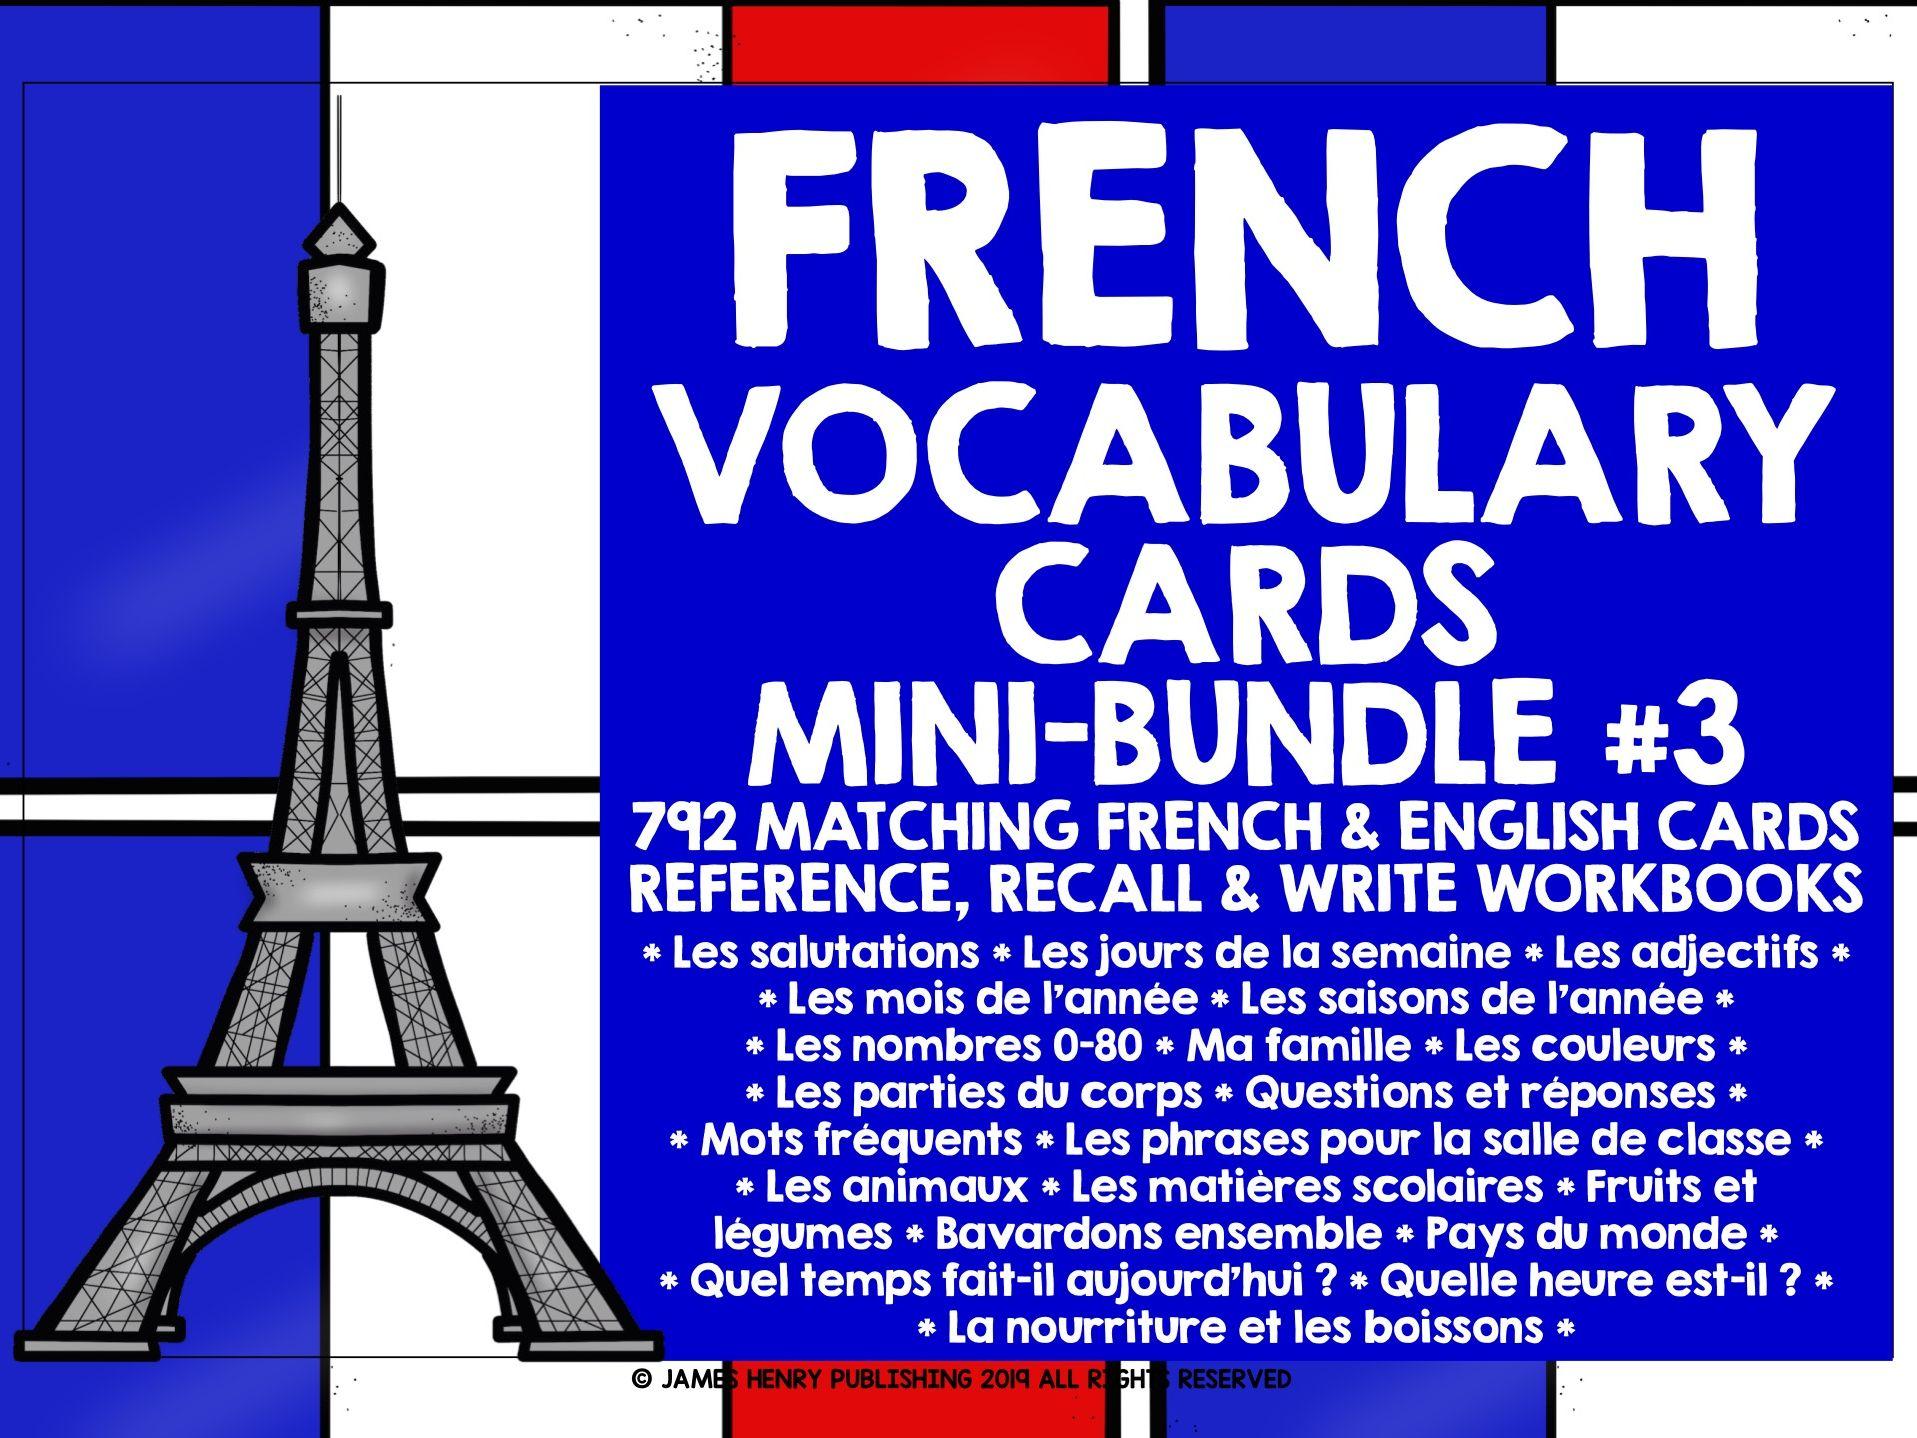 FRENCH VOCABULARY CARDS MINI-BUNDLE 3